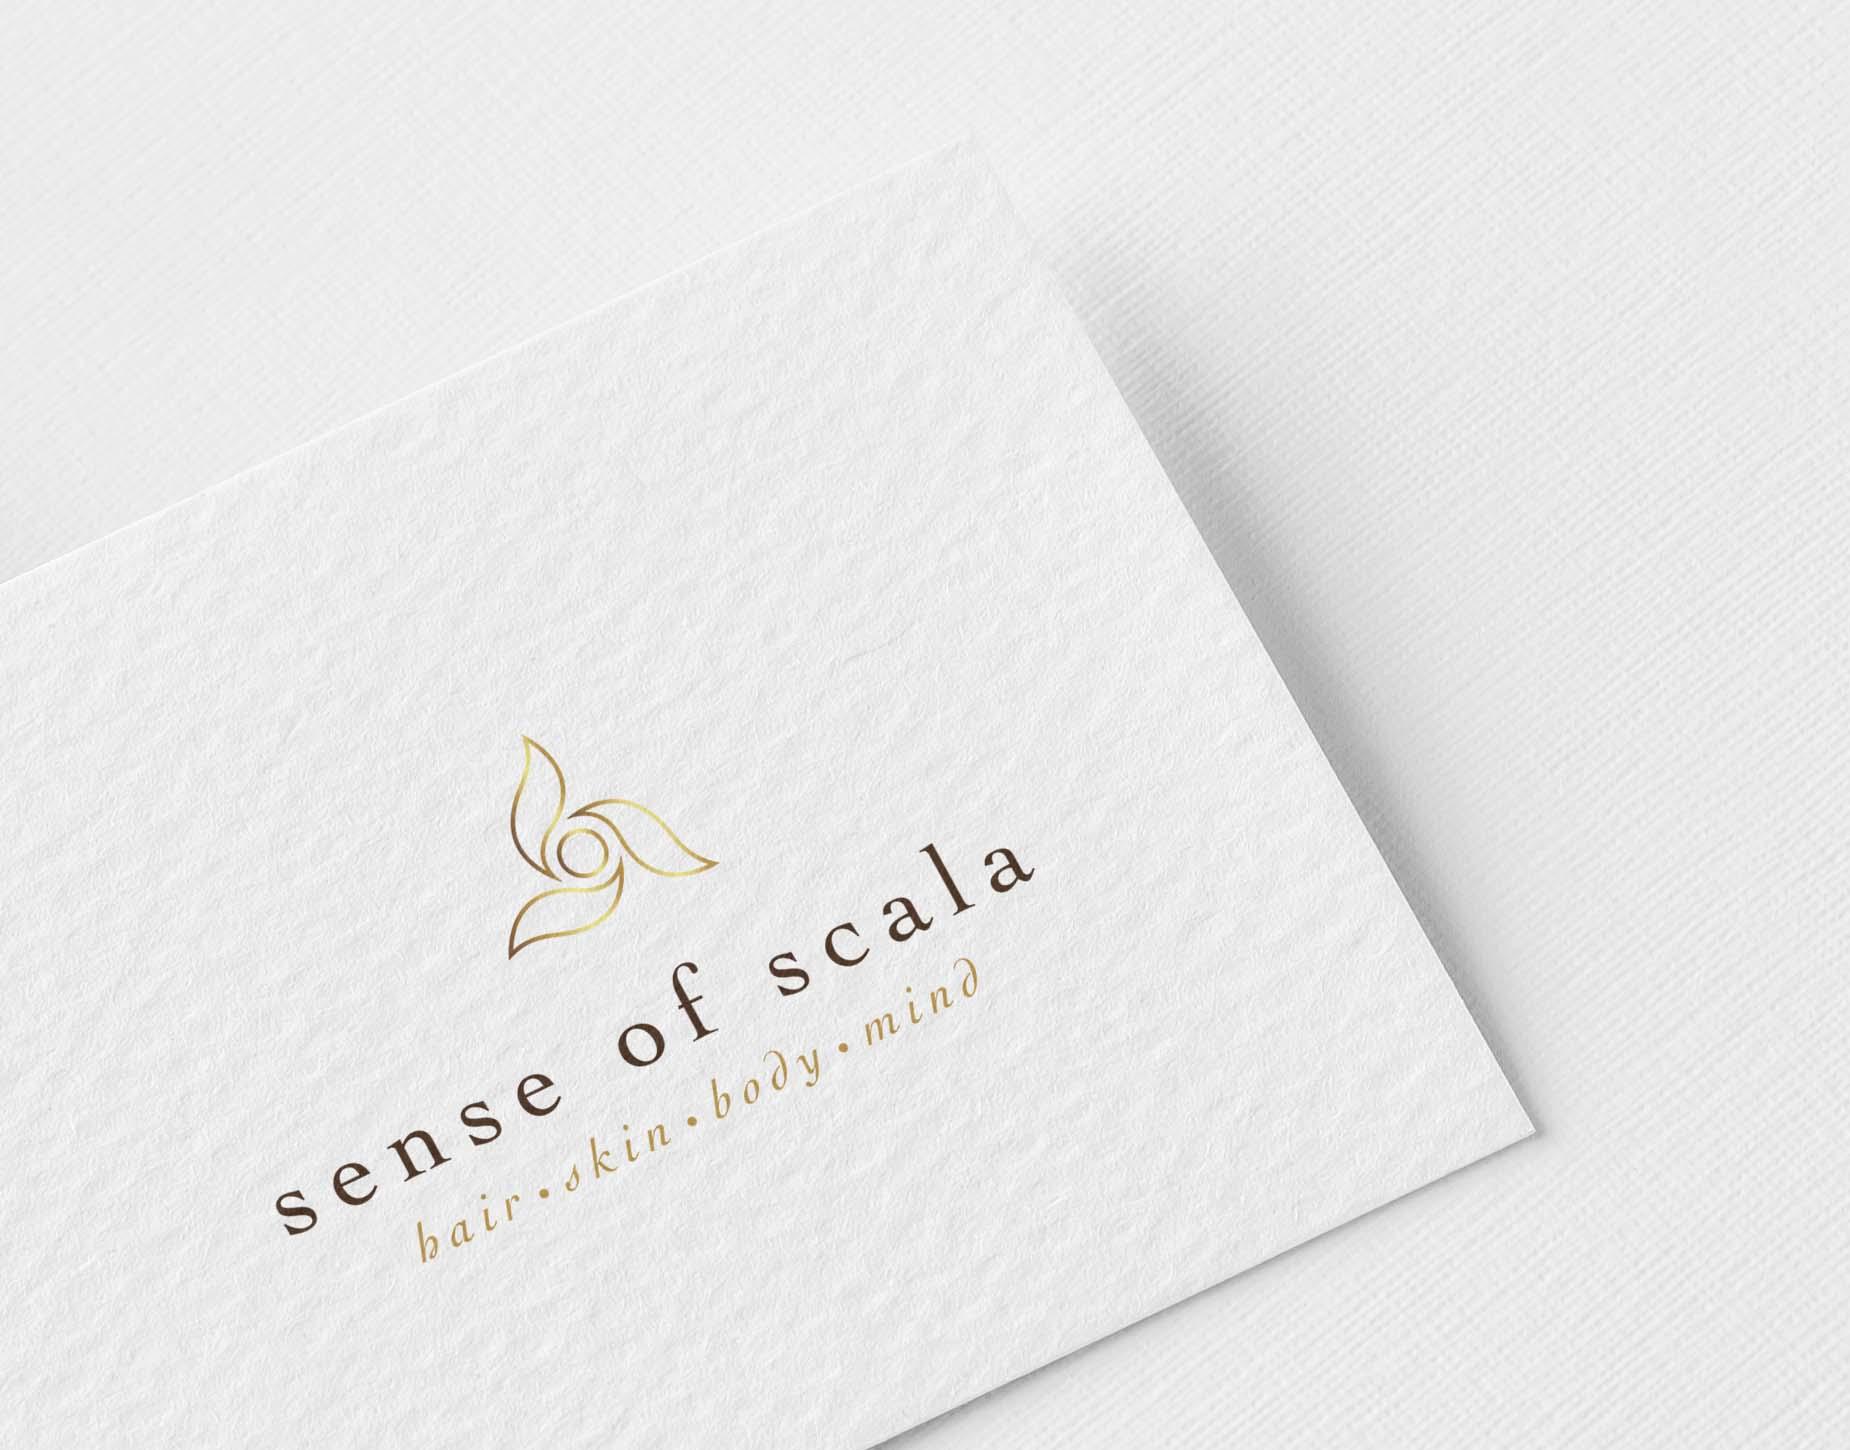 Logo ontwerp genk sense of scala